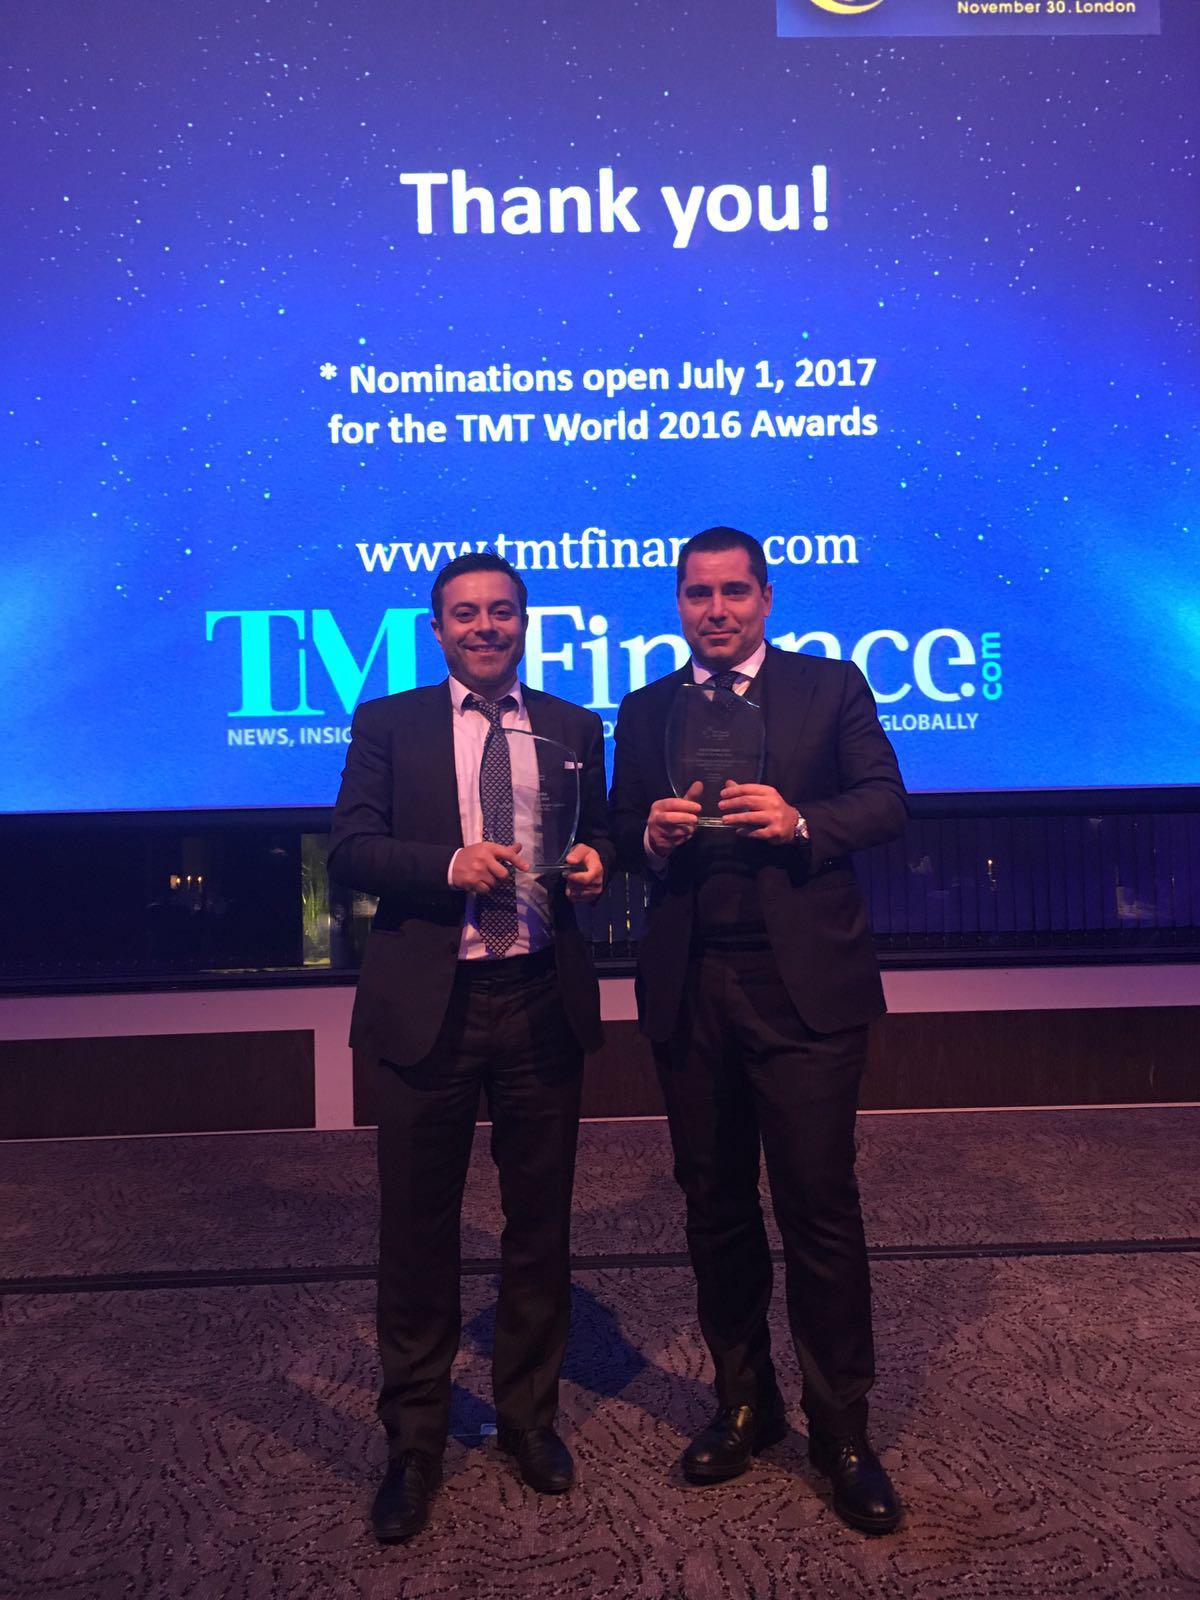 Riccardo Silva & Andrea Radrizzani with TMT Finance award